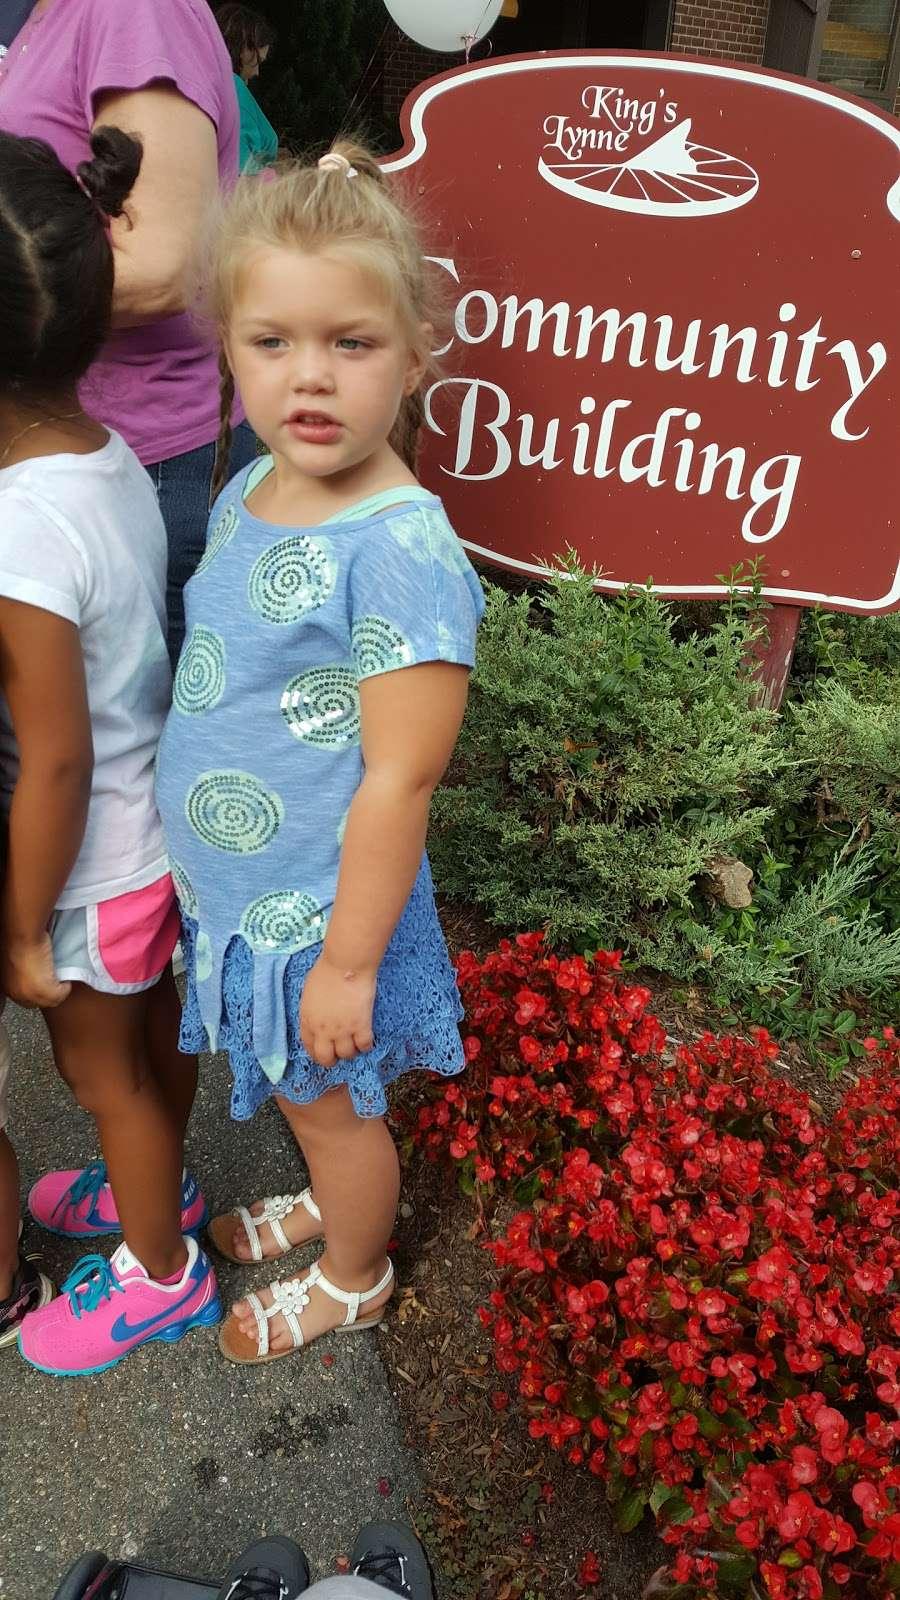 Breed Park - park  | Photo 10 of 10 | Address: Lynn, MA 01905, USA